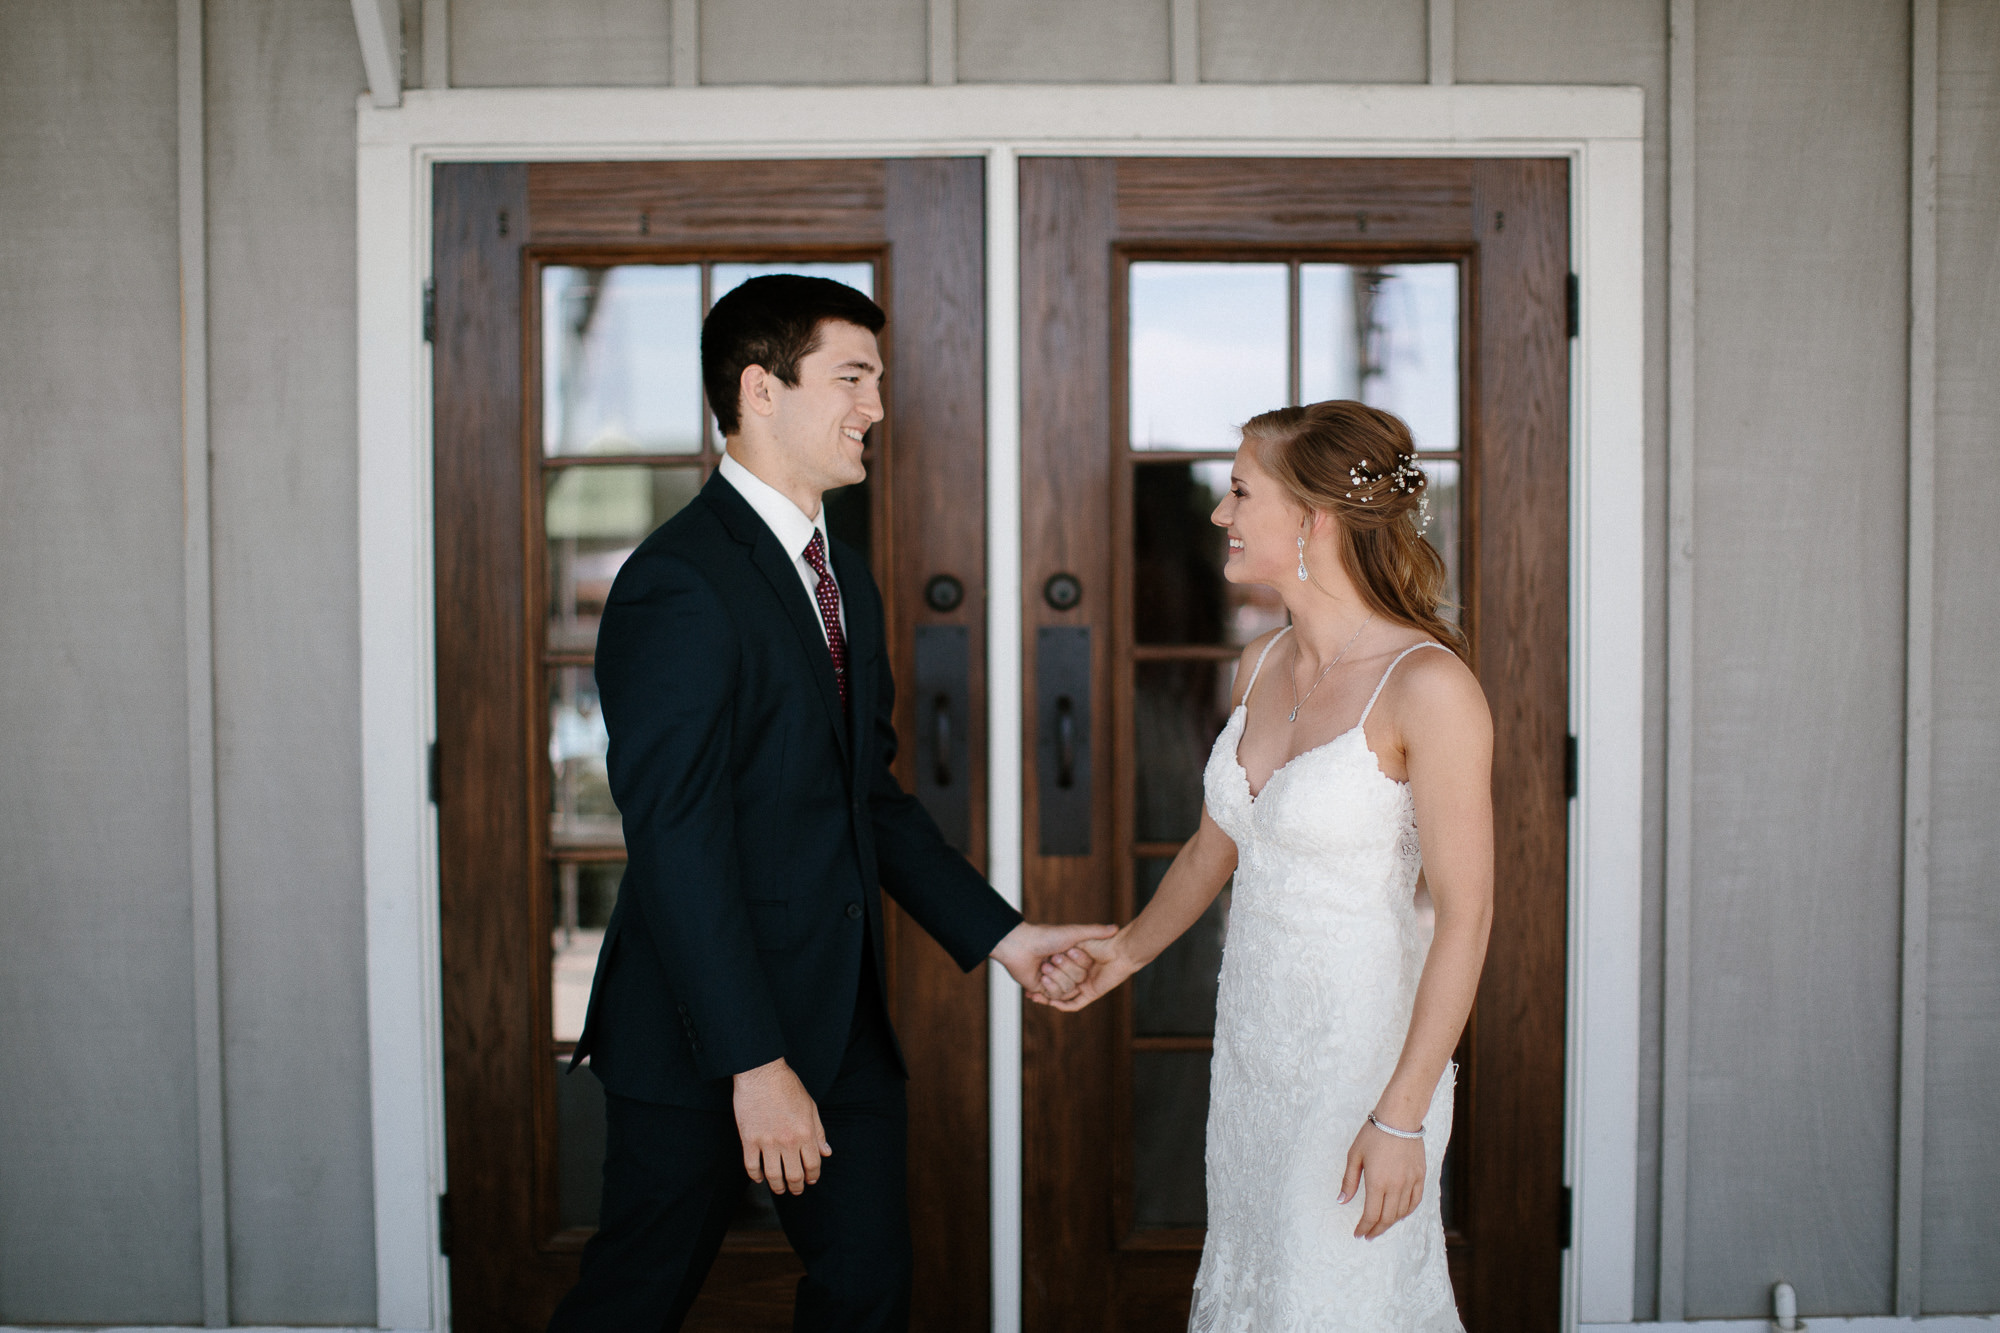 wedding-elopement-adventerous-romantic-timeless-south-dakota-blue-haven-barn-020.jpg